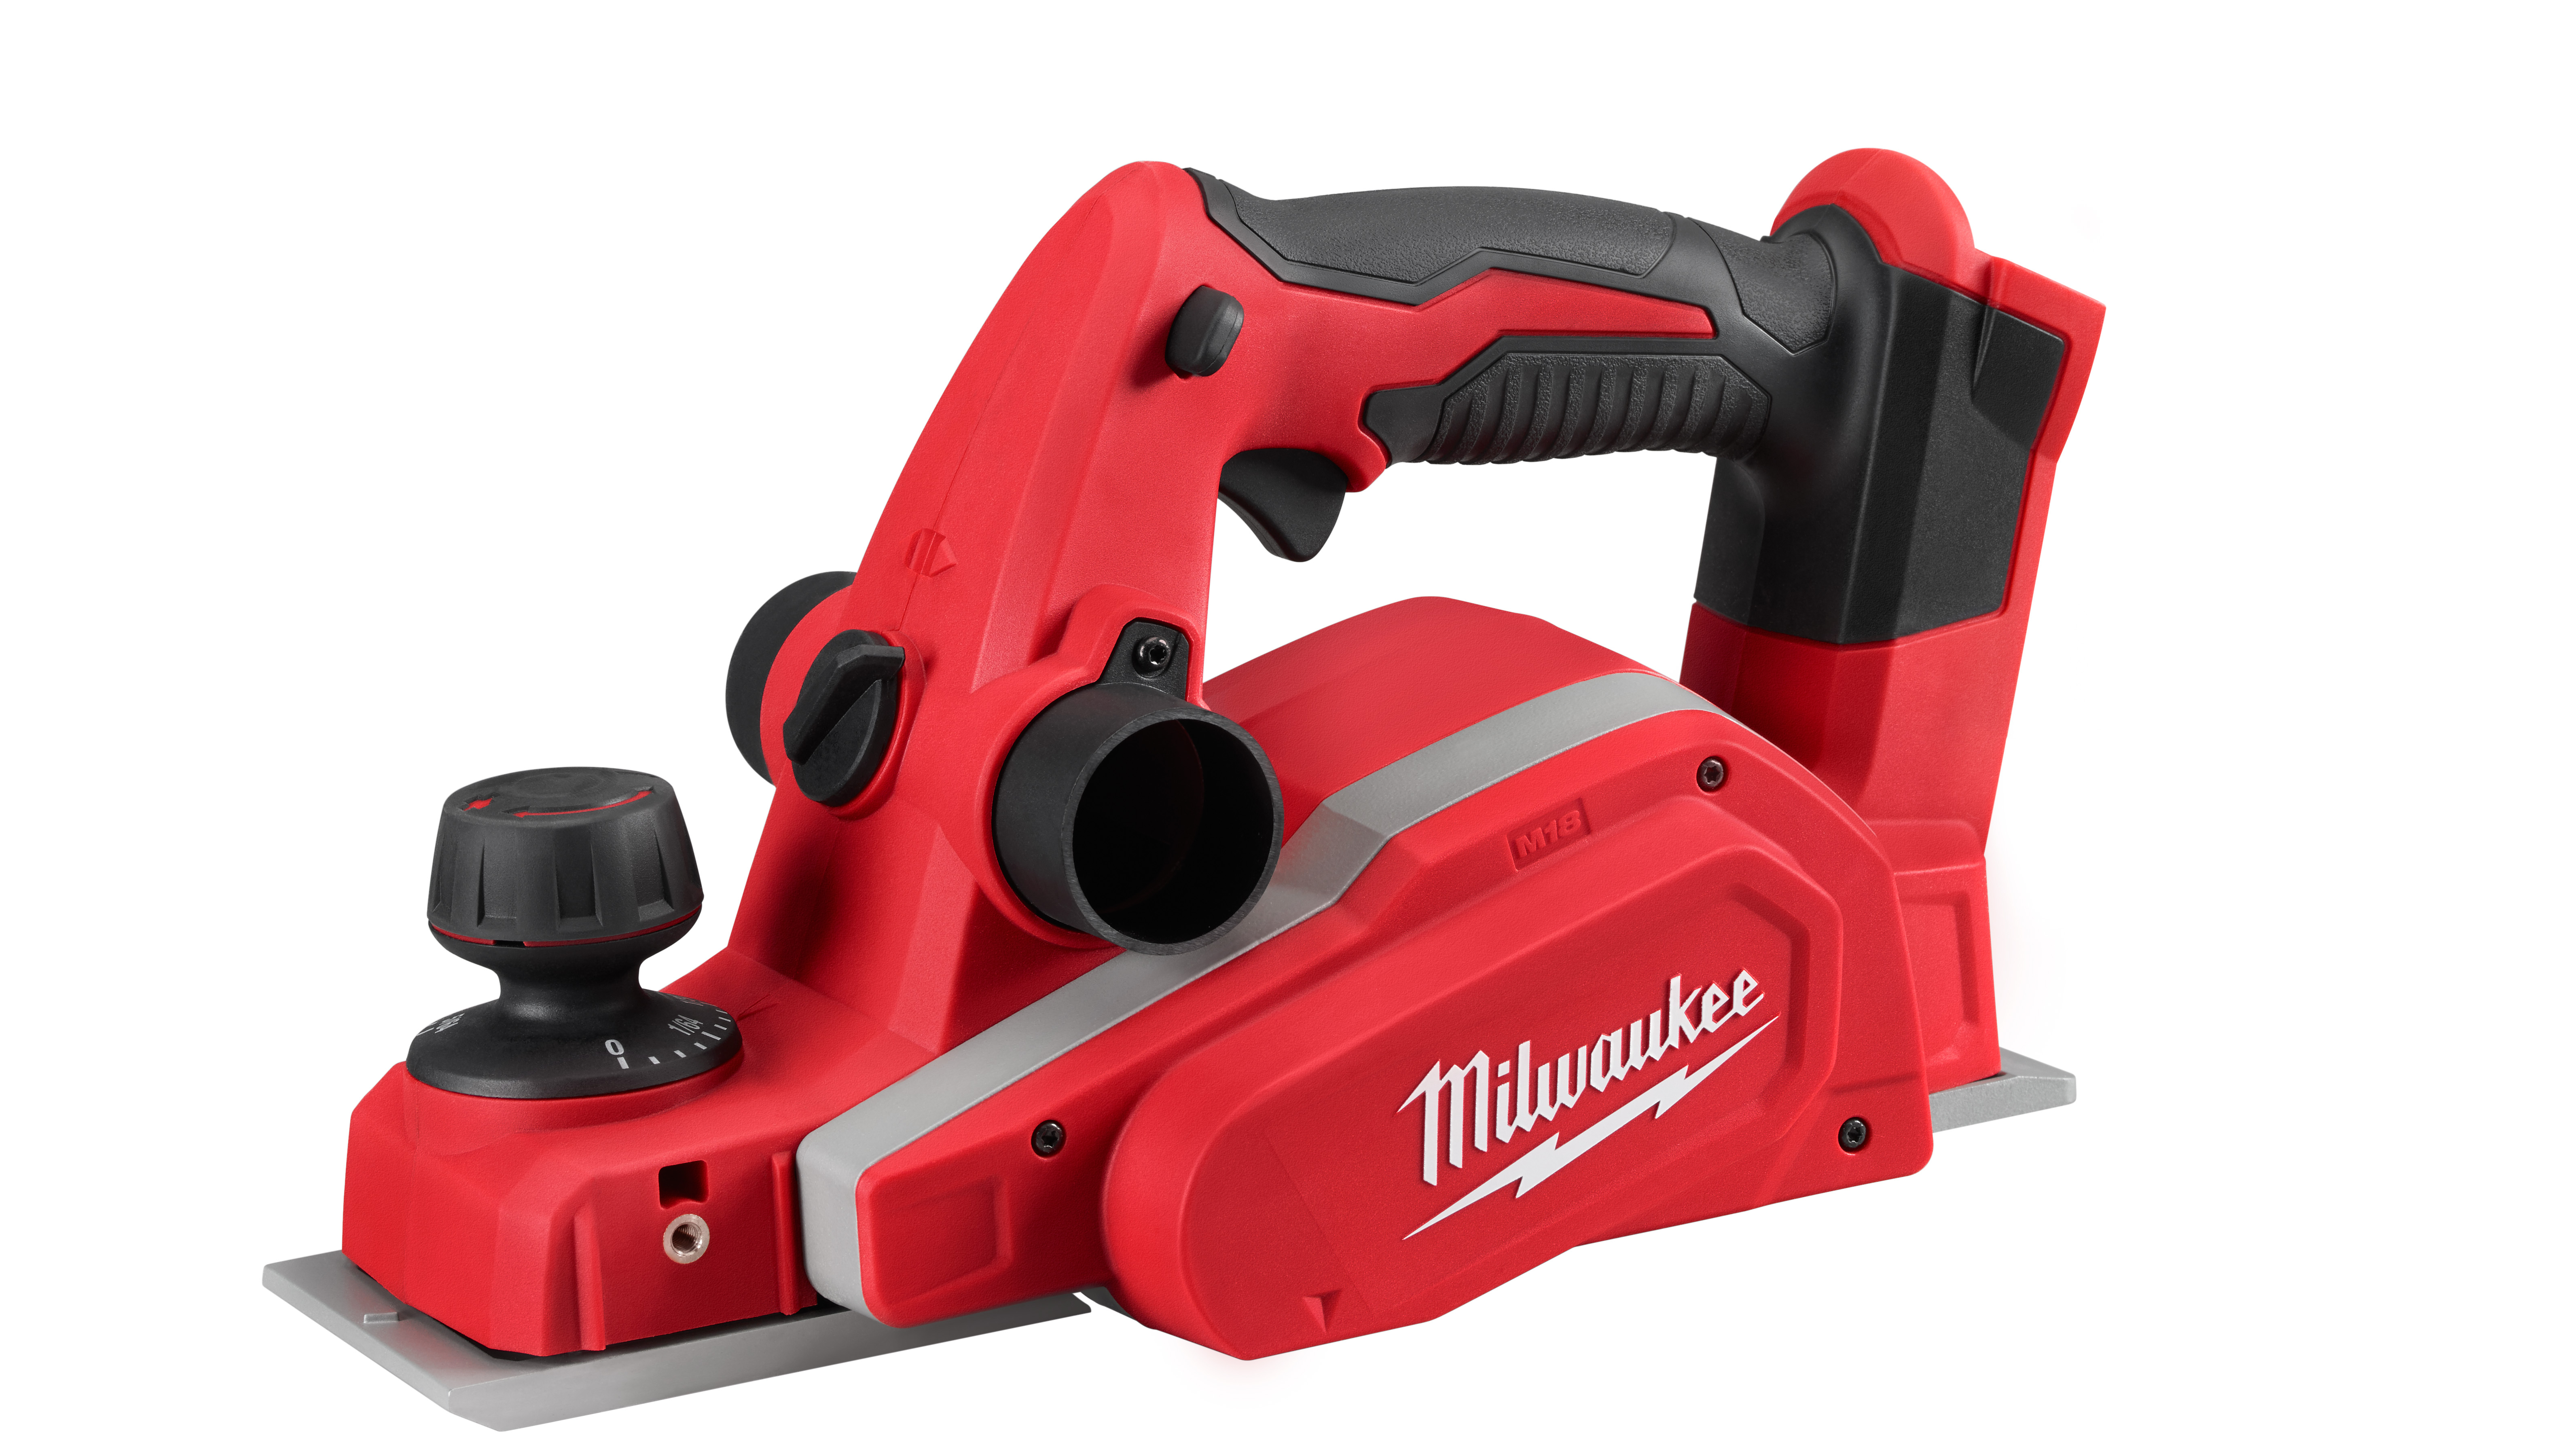 Milwaukee® M18™ 2623-21 Planer Kit, 3-1/4 in W Cutting, 5/64 in Depth of Cut, 14000 rpm Speed, 18 VDC, REDLITHIUM™ XC™ Battery